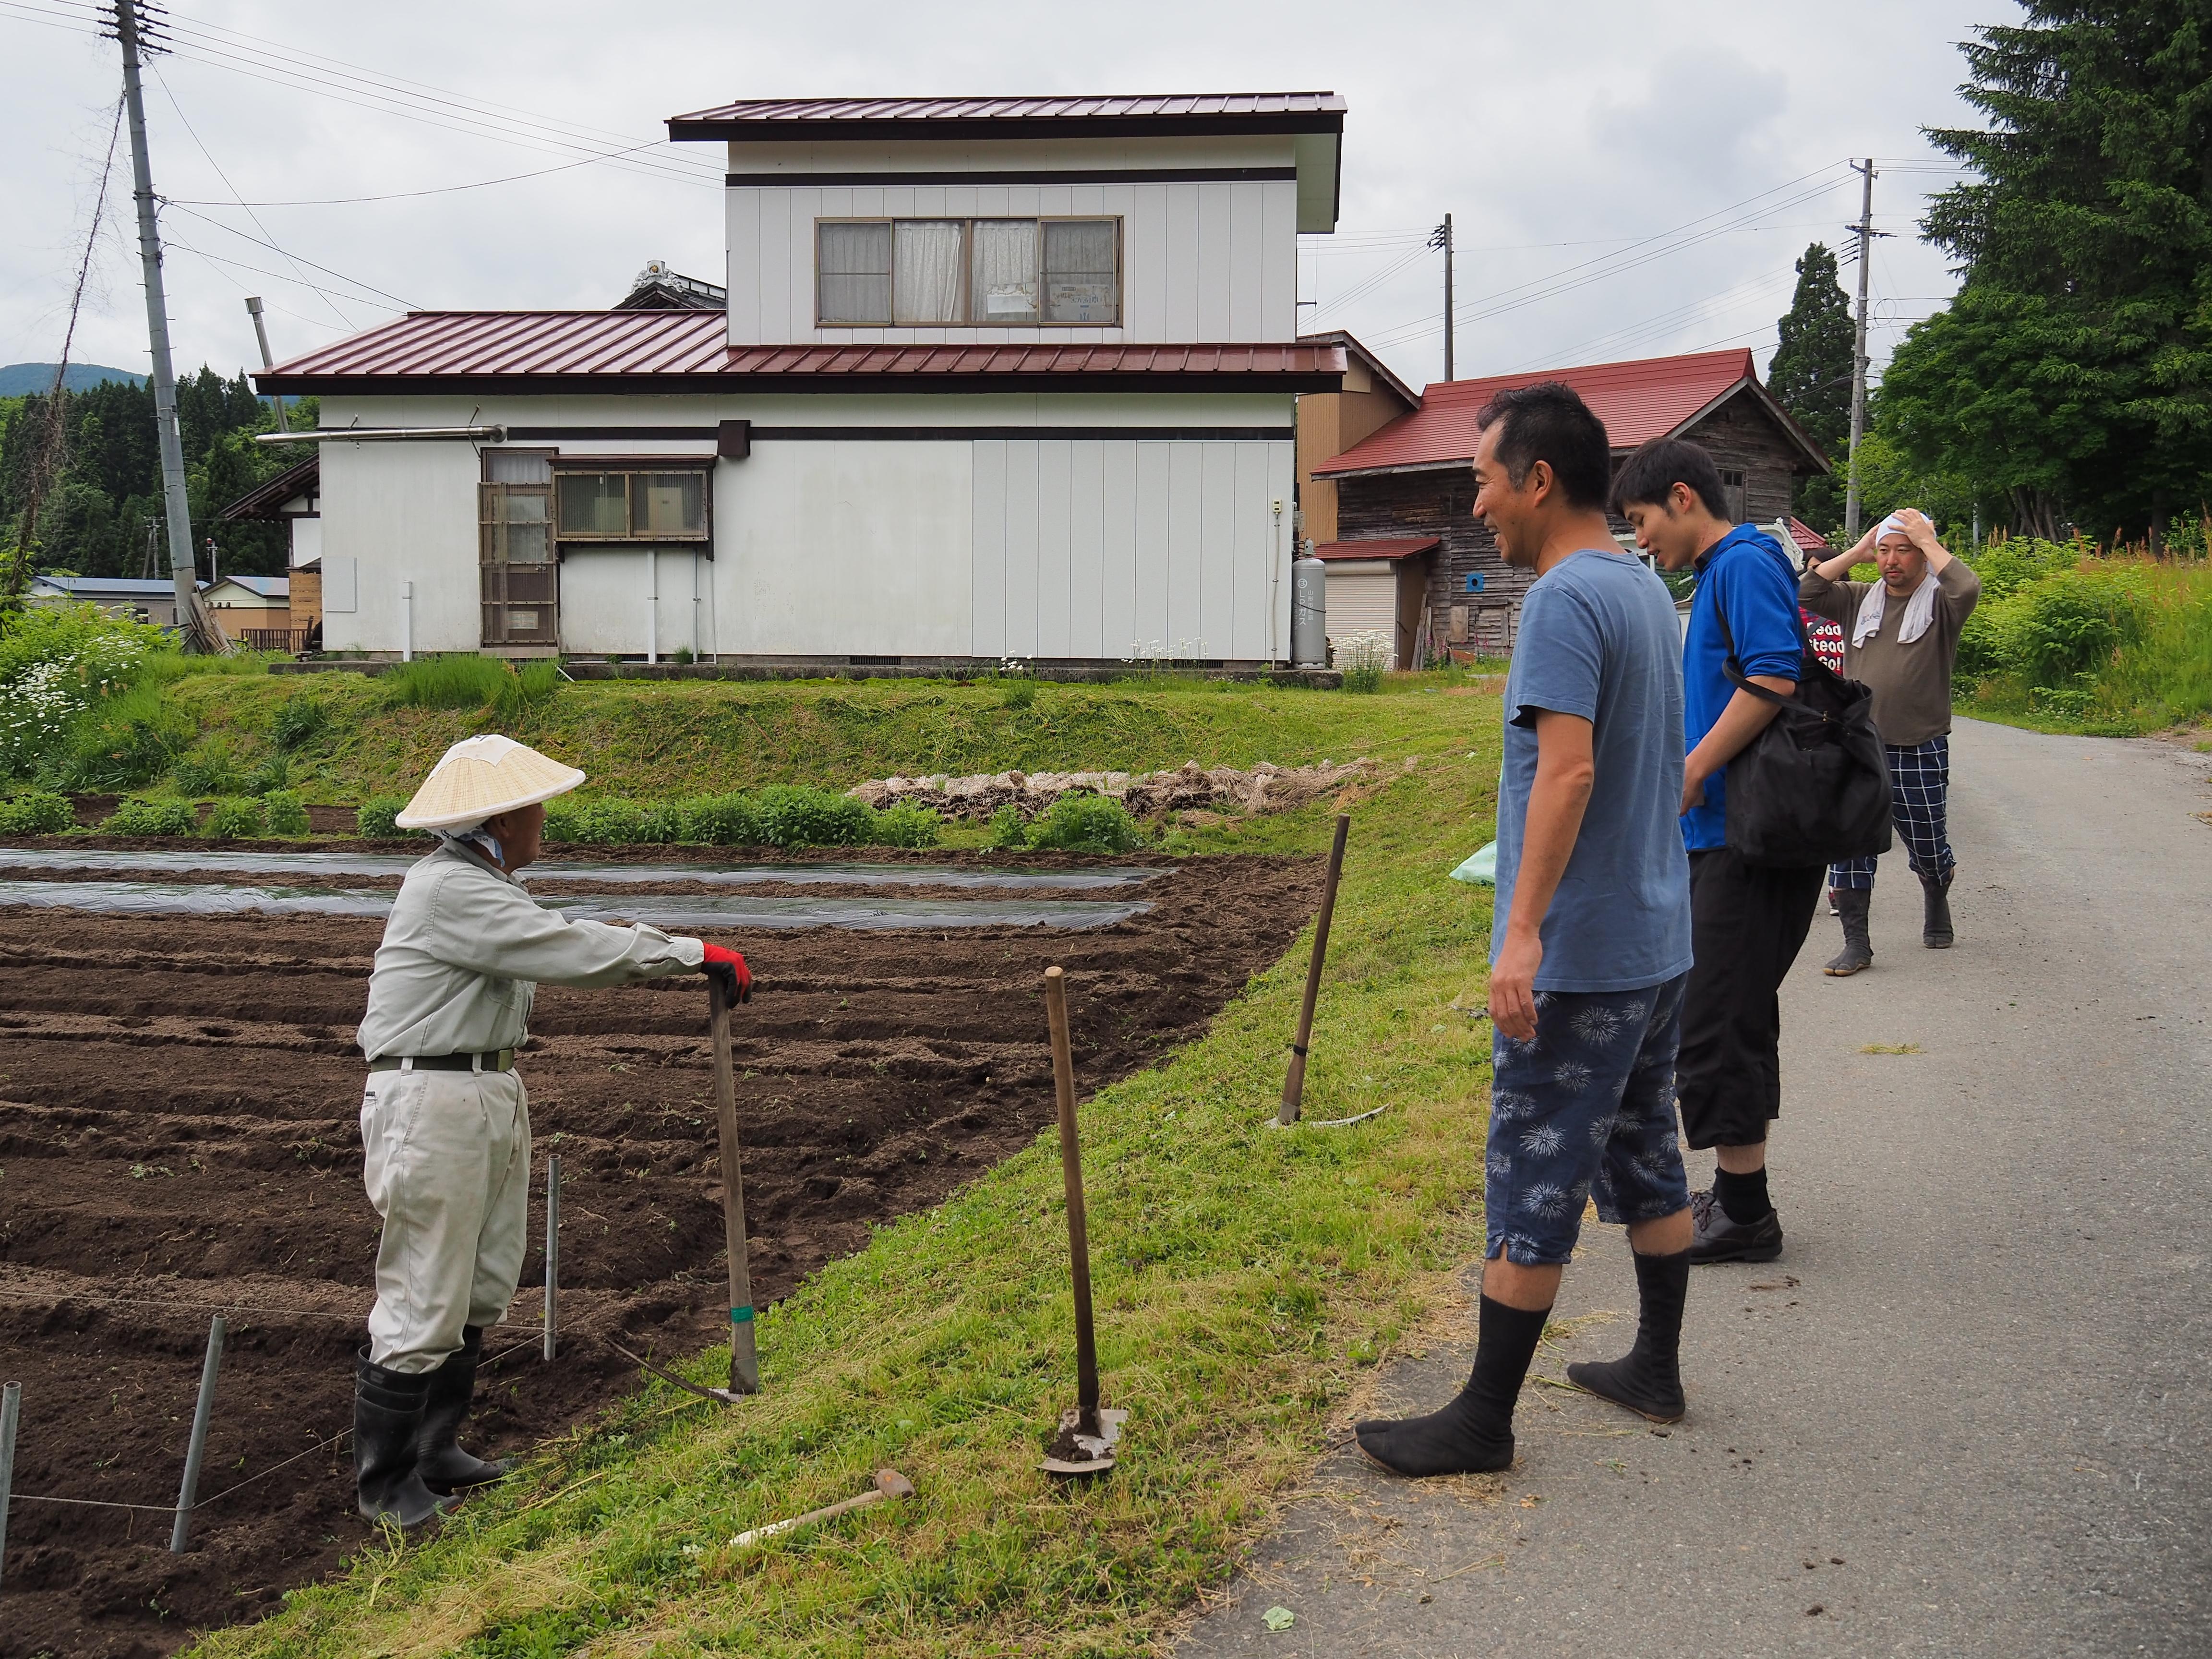 P6170012 - 山形県戸沢村での農業イベント